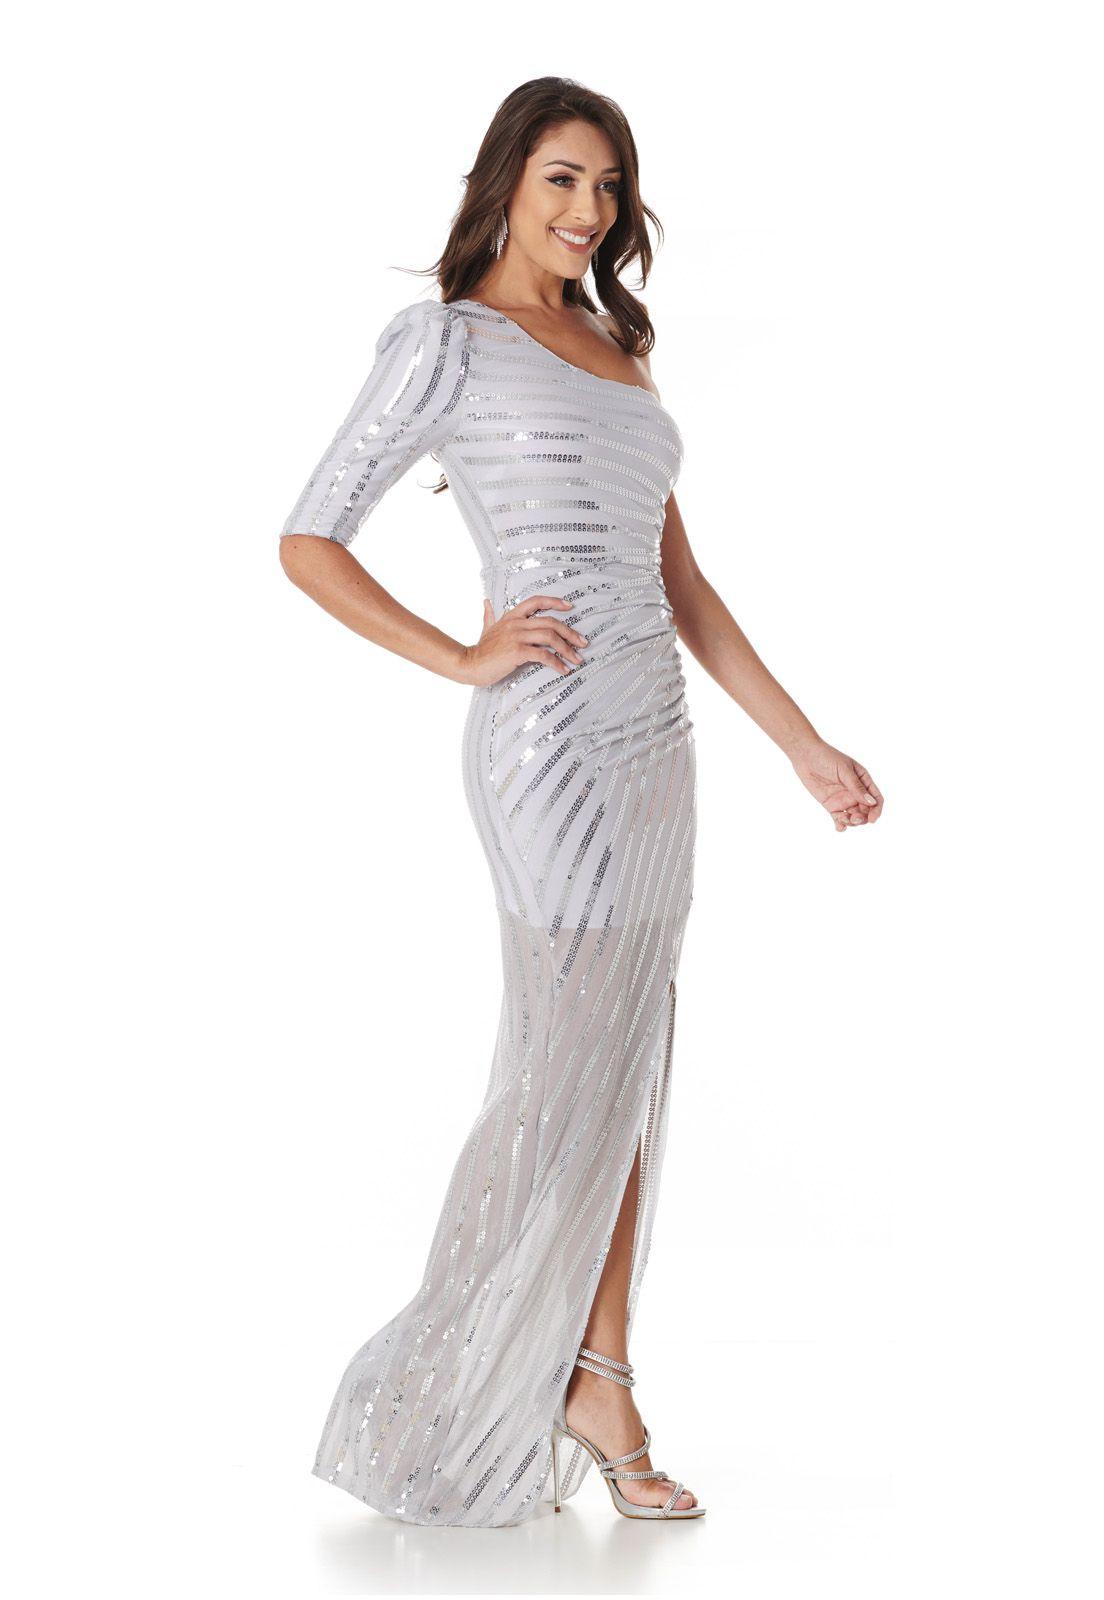 Vestido Longo Listras Paetê Cinza Lala Dubi